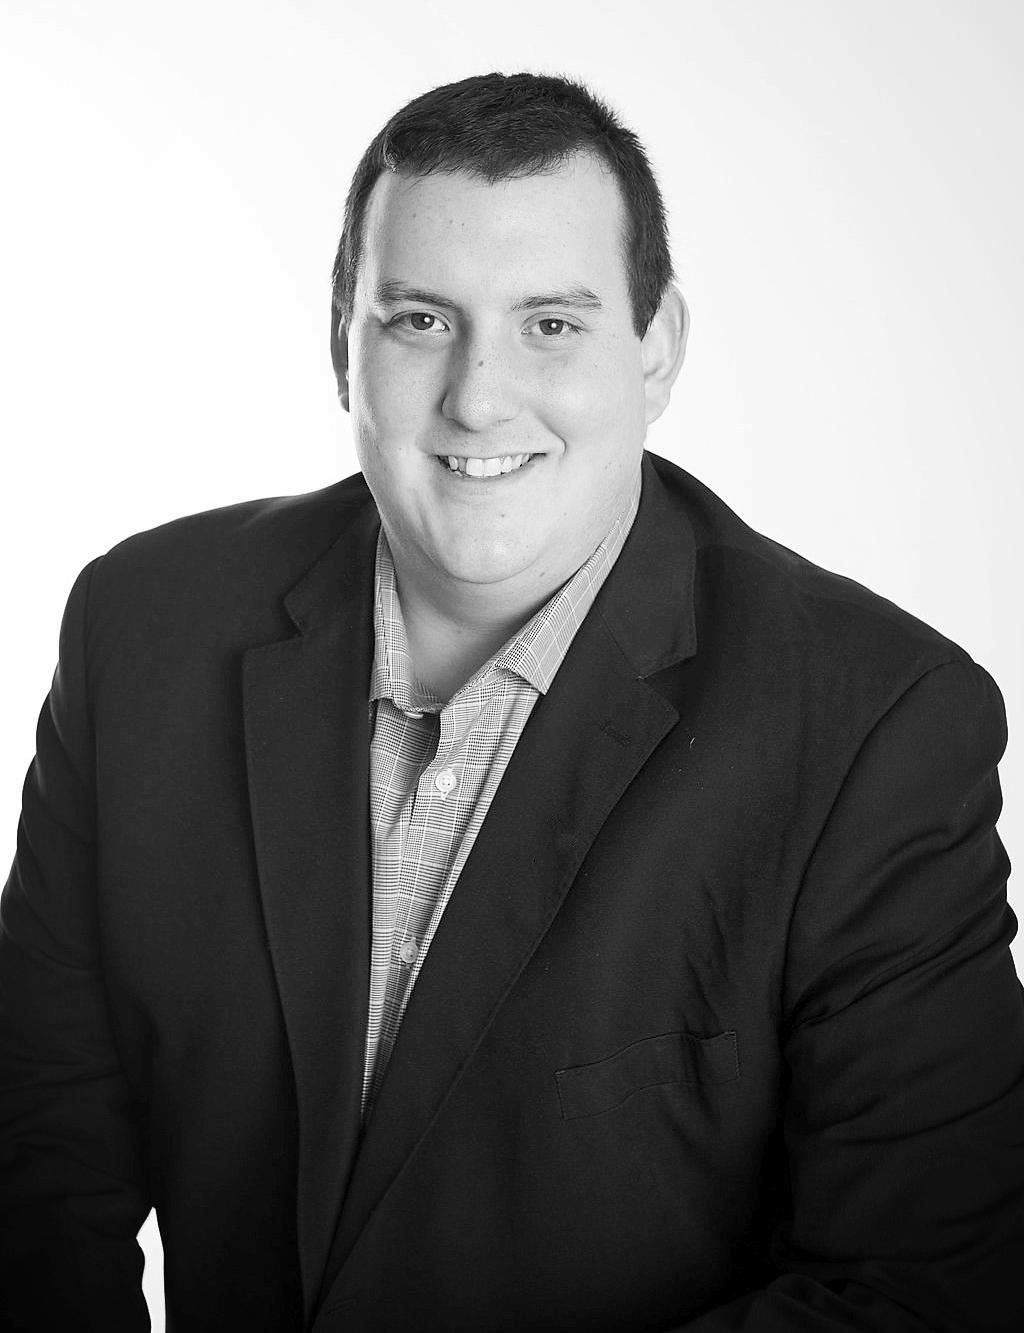 Michael Scott